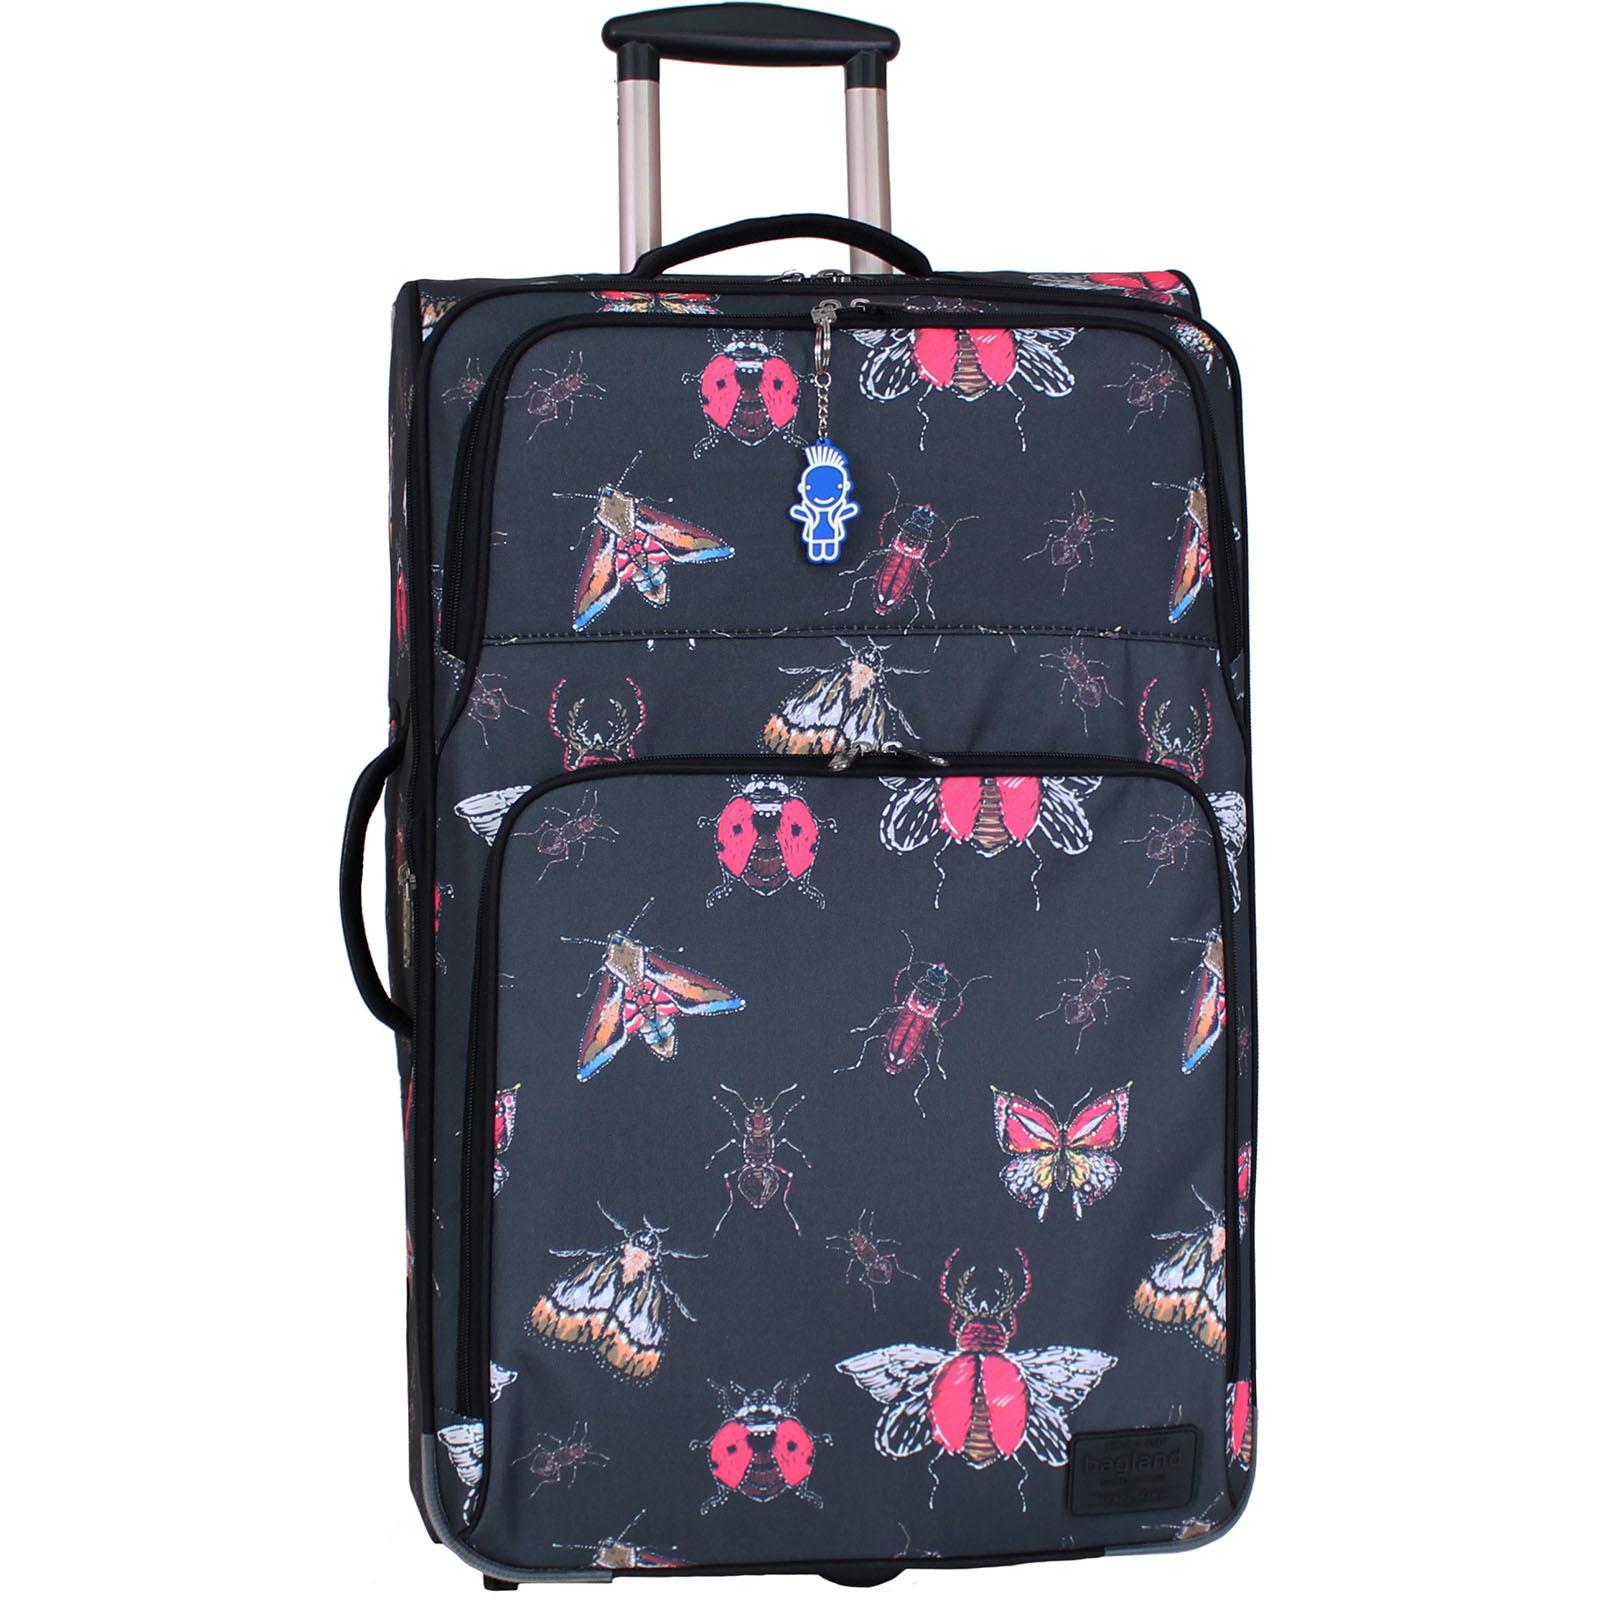 Дорожные чемоданы Чемодан Bagland Леон большой дизайн 70 л. сублімація 154 (0037666274) IMG_9896.JPG